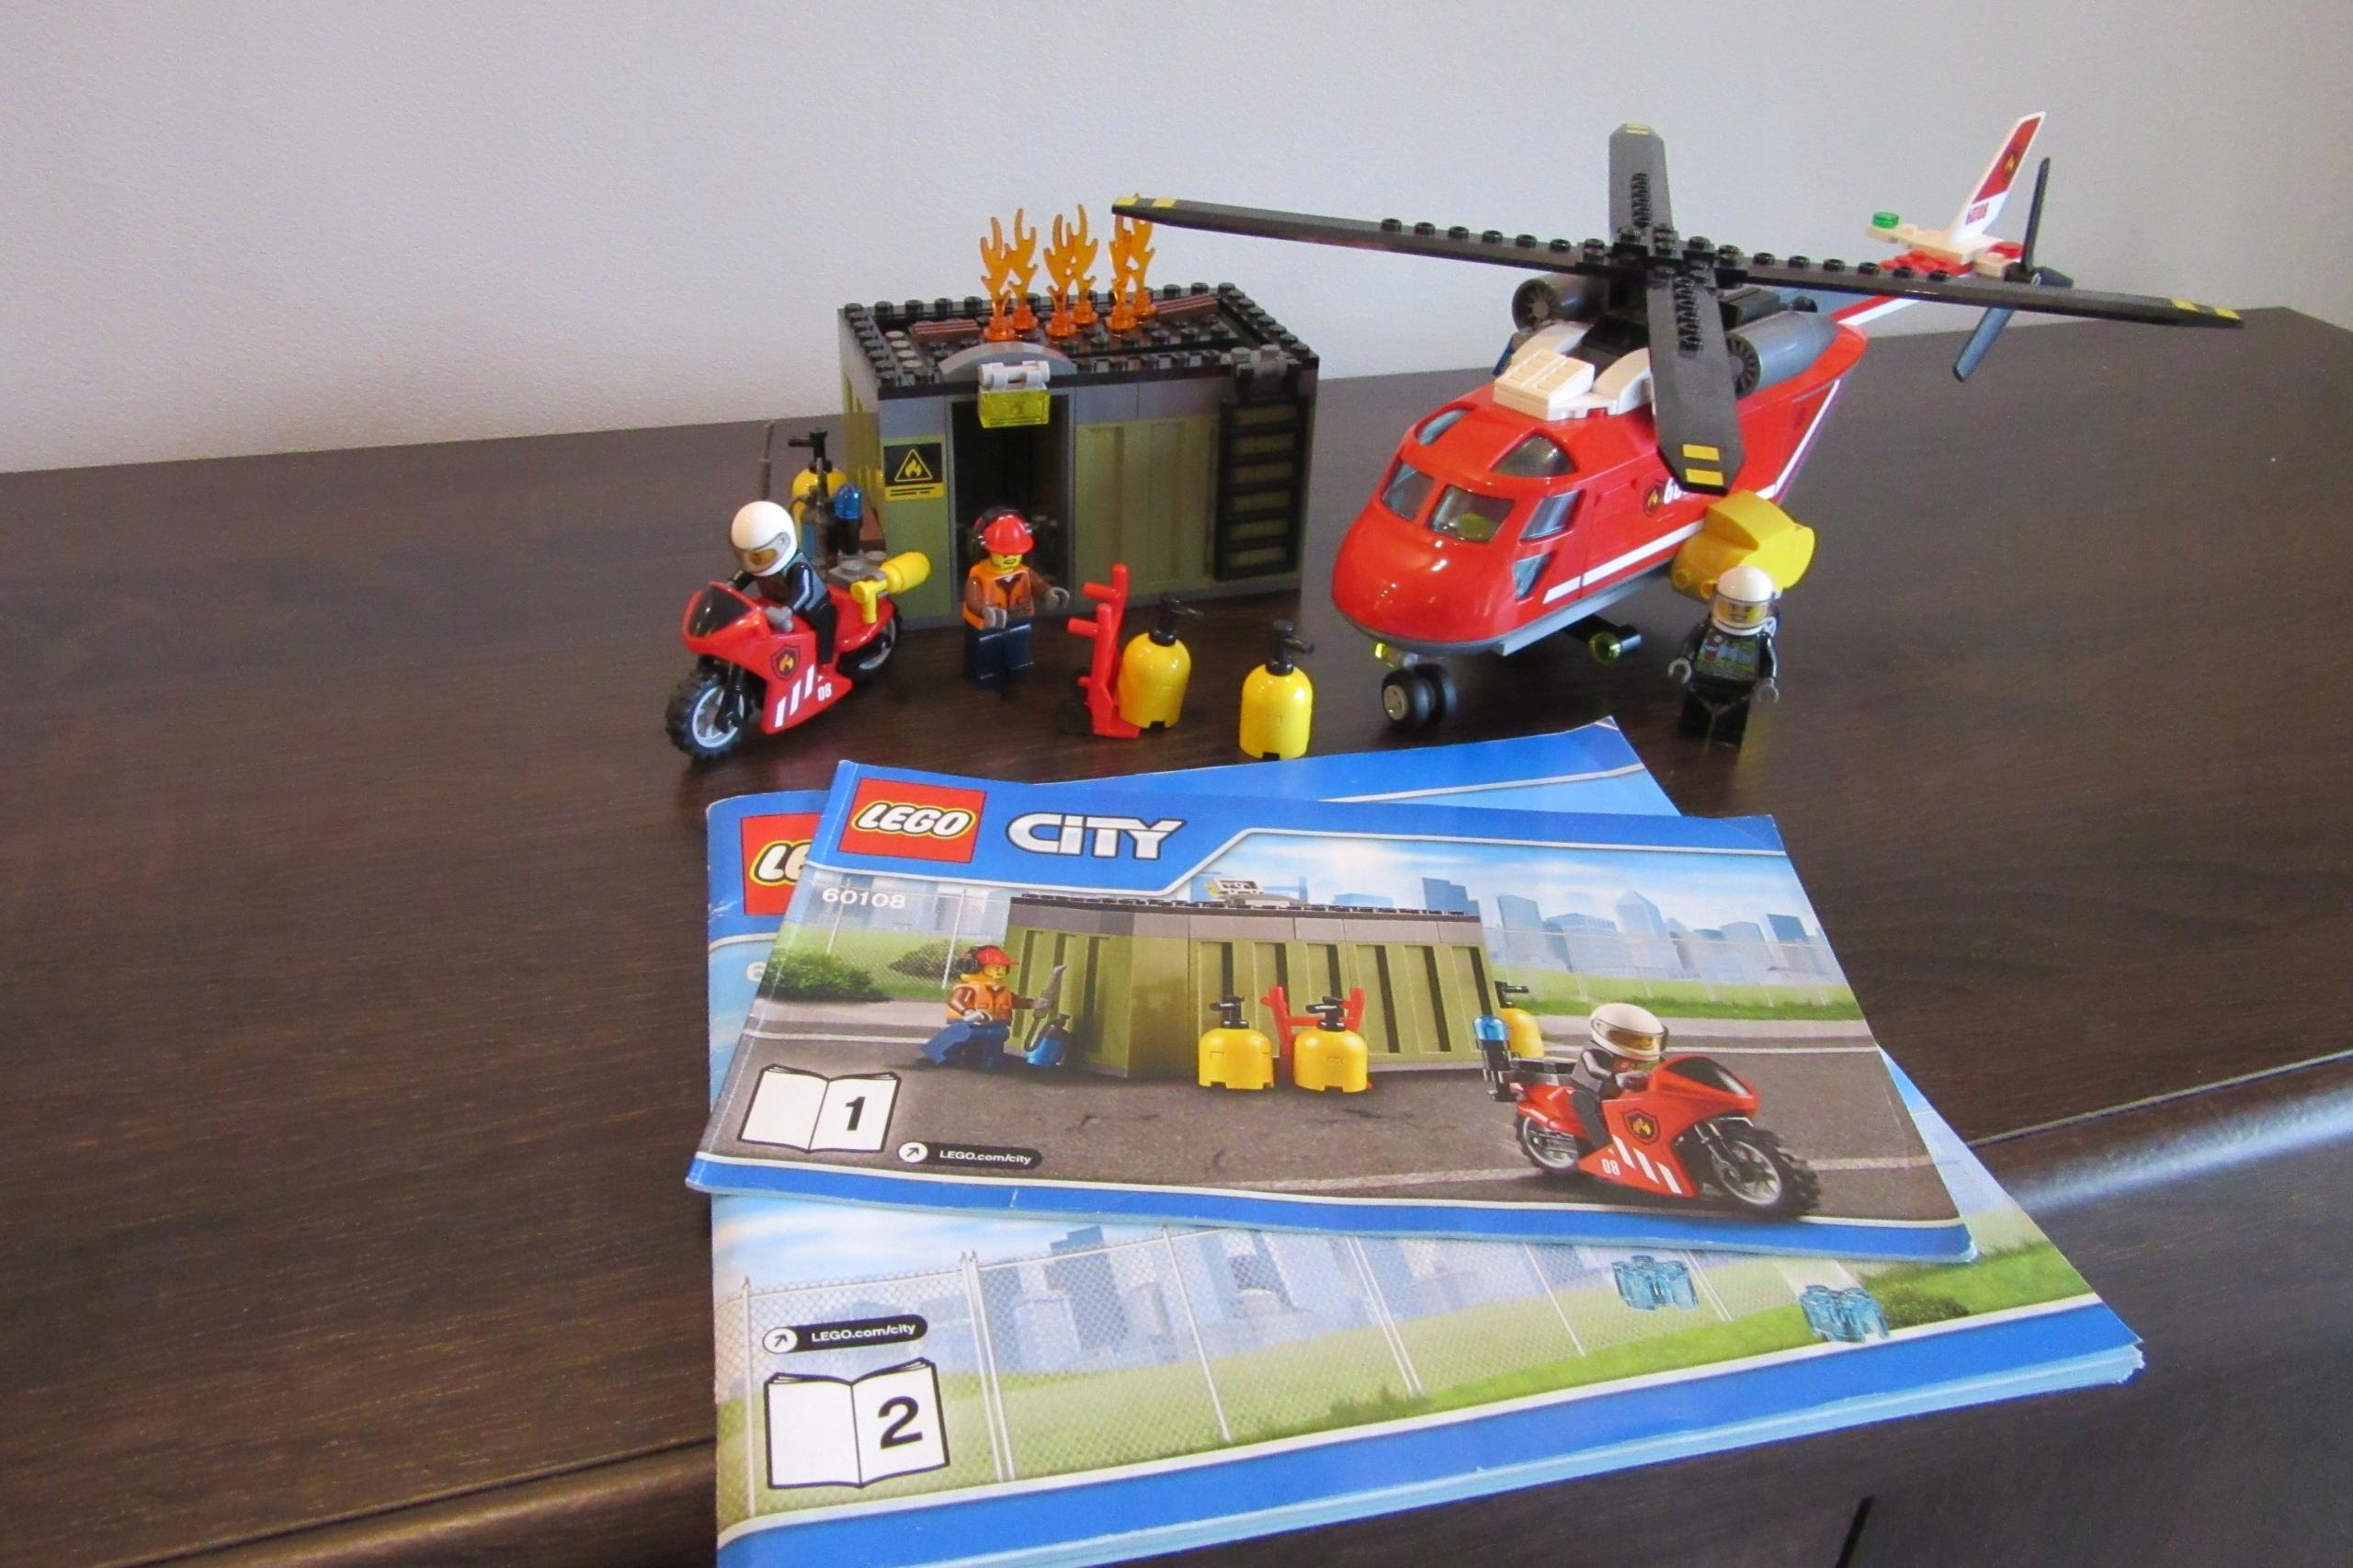 Lego City Helikopter Strażacki Pożar Straż 60108 7693748348